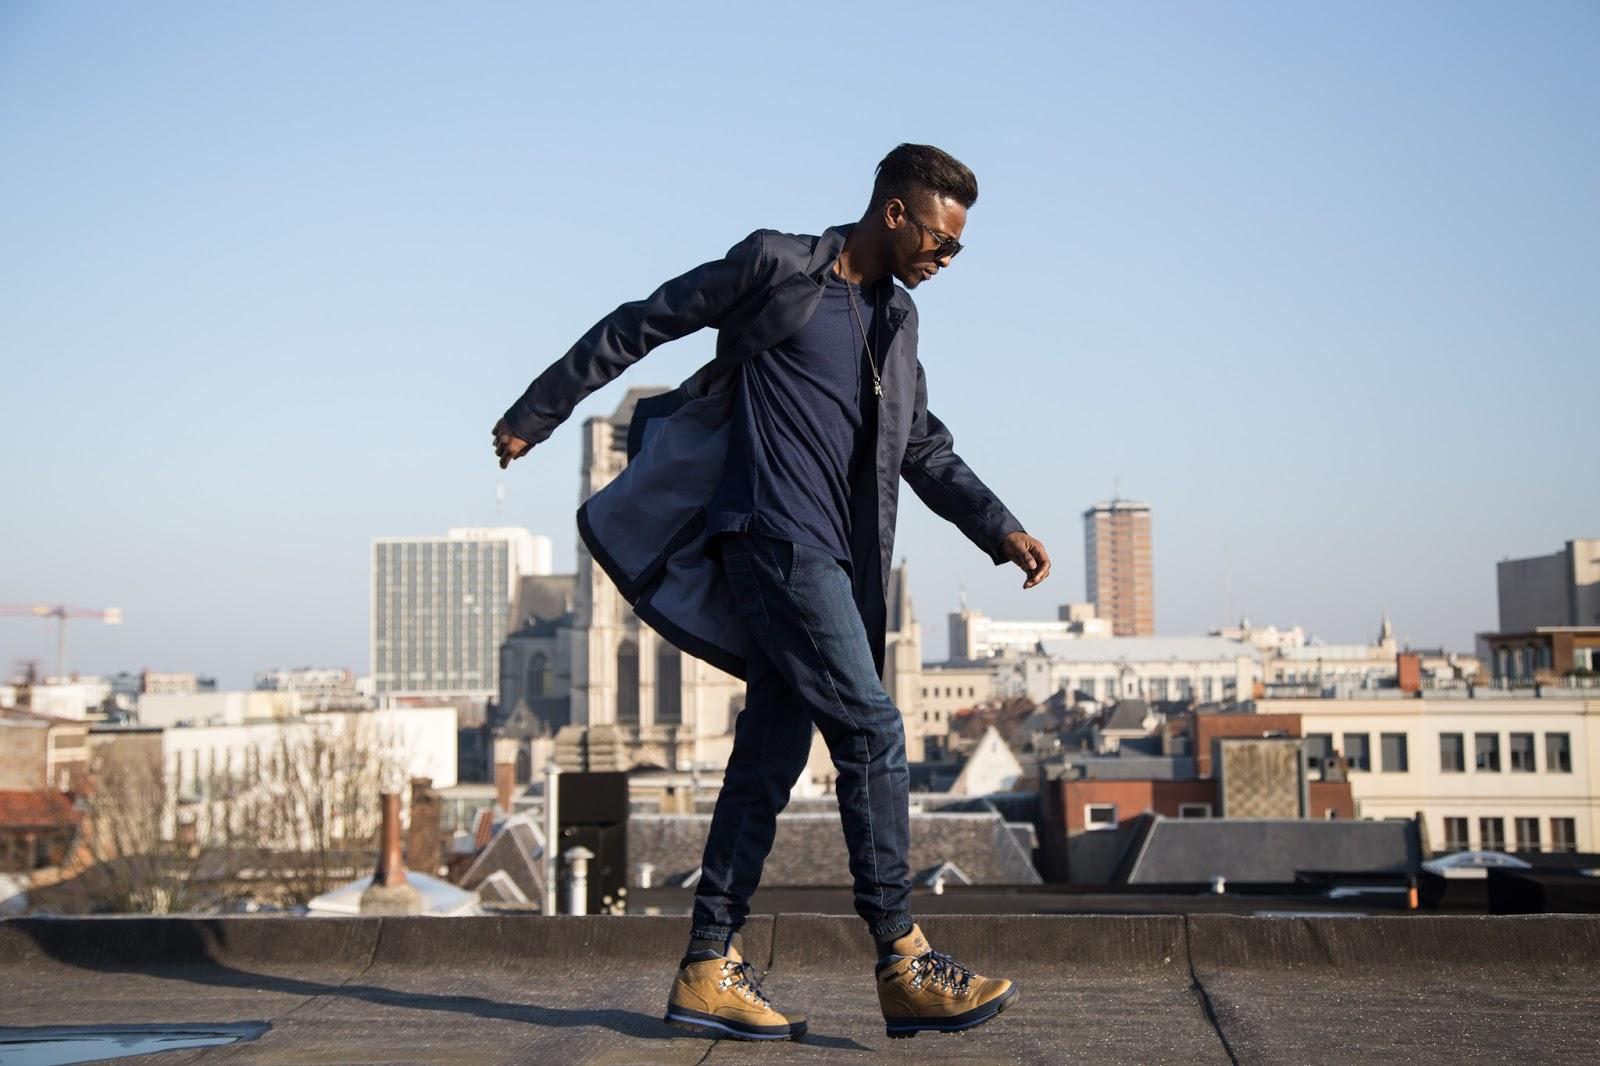 JONTHEGOLD rooftop skyline blue g-star raw coat wefashion jogger  timberland boots salvatore ferragamo sunglasses bohemian vixen accessories